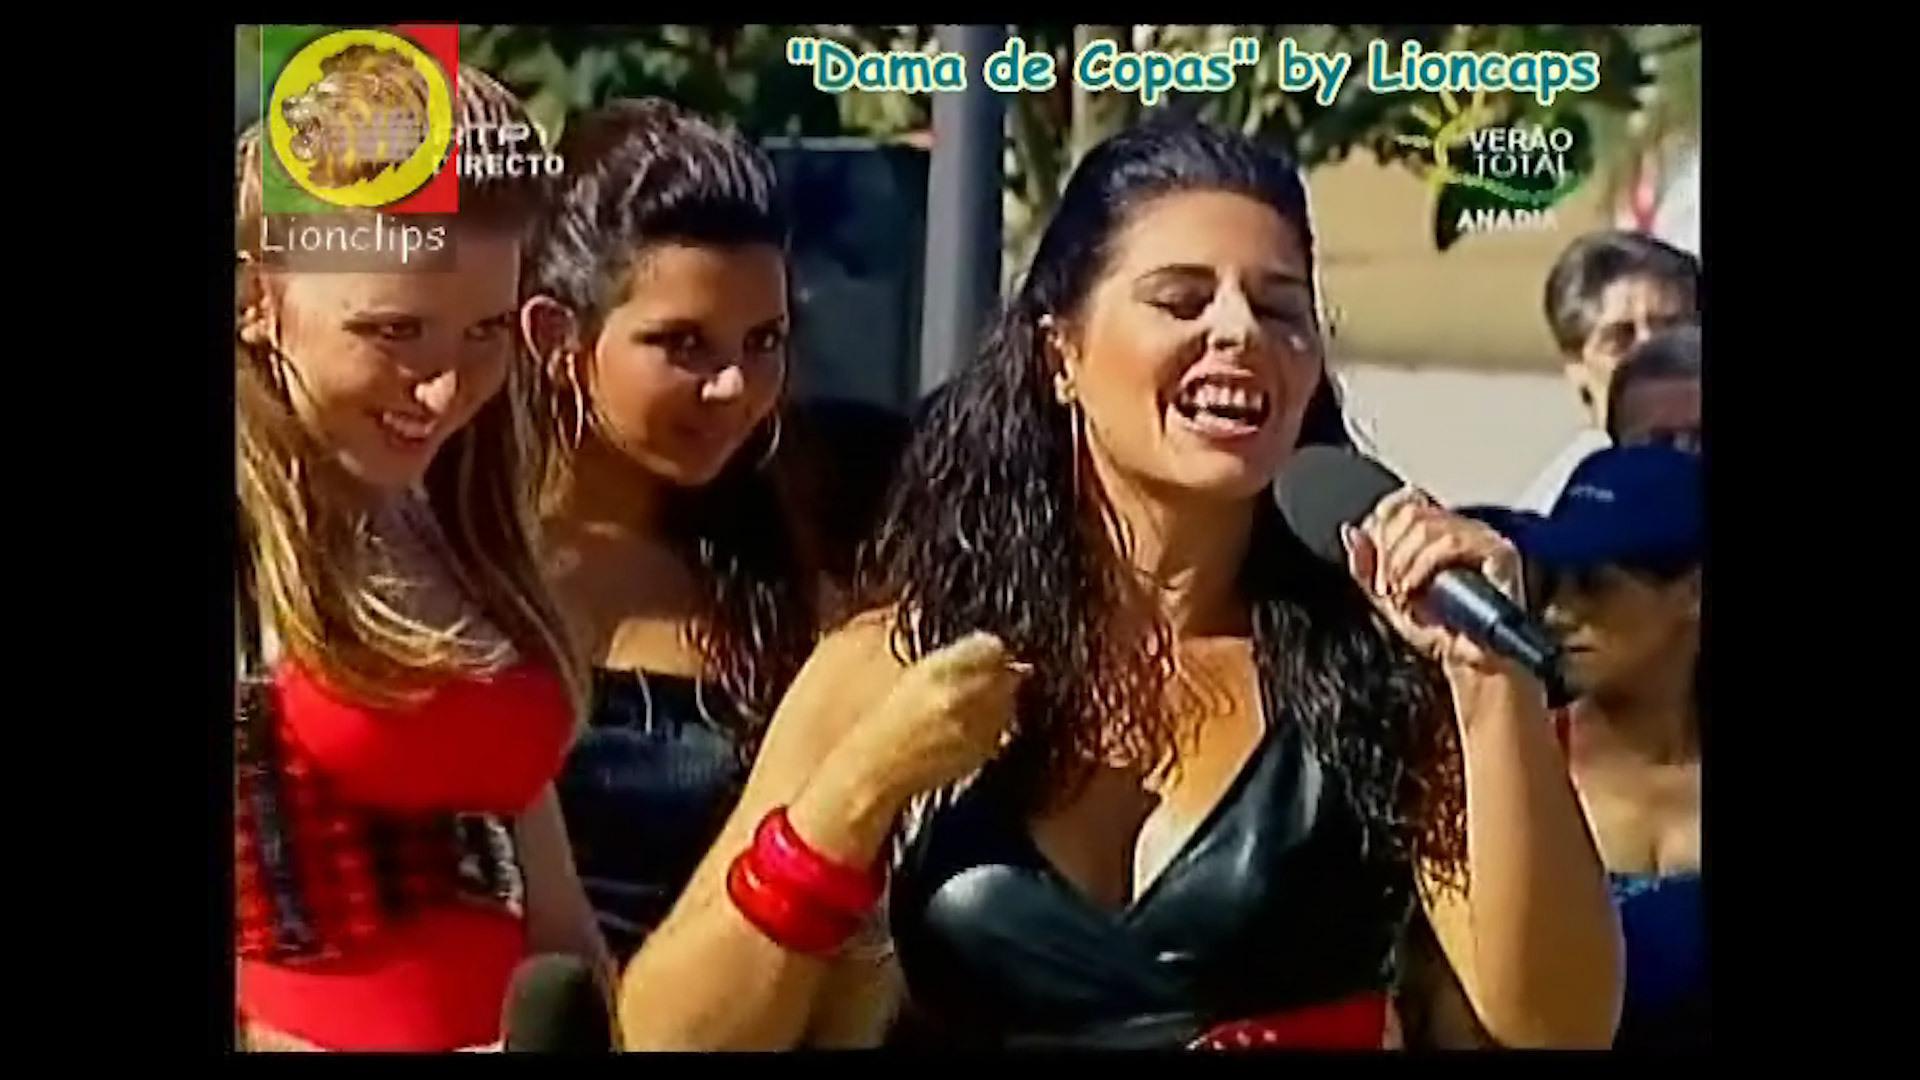 bestoff_portugal_d1_lioncaps_03_06_2021 (10).jpg